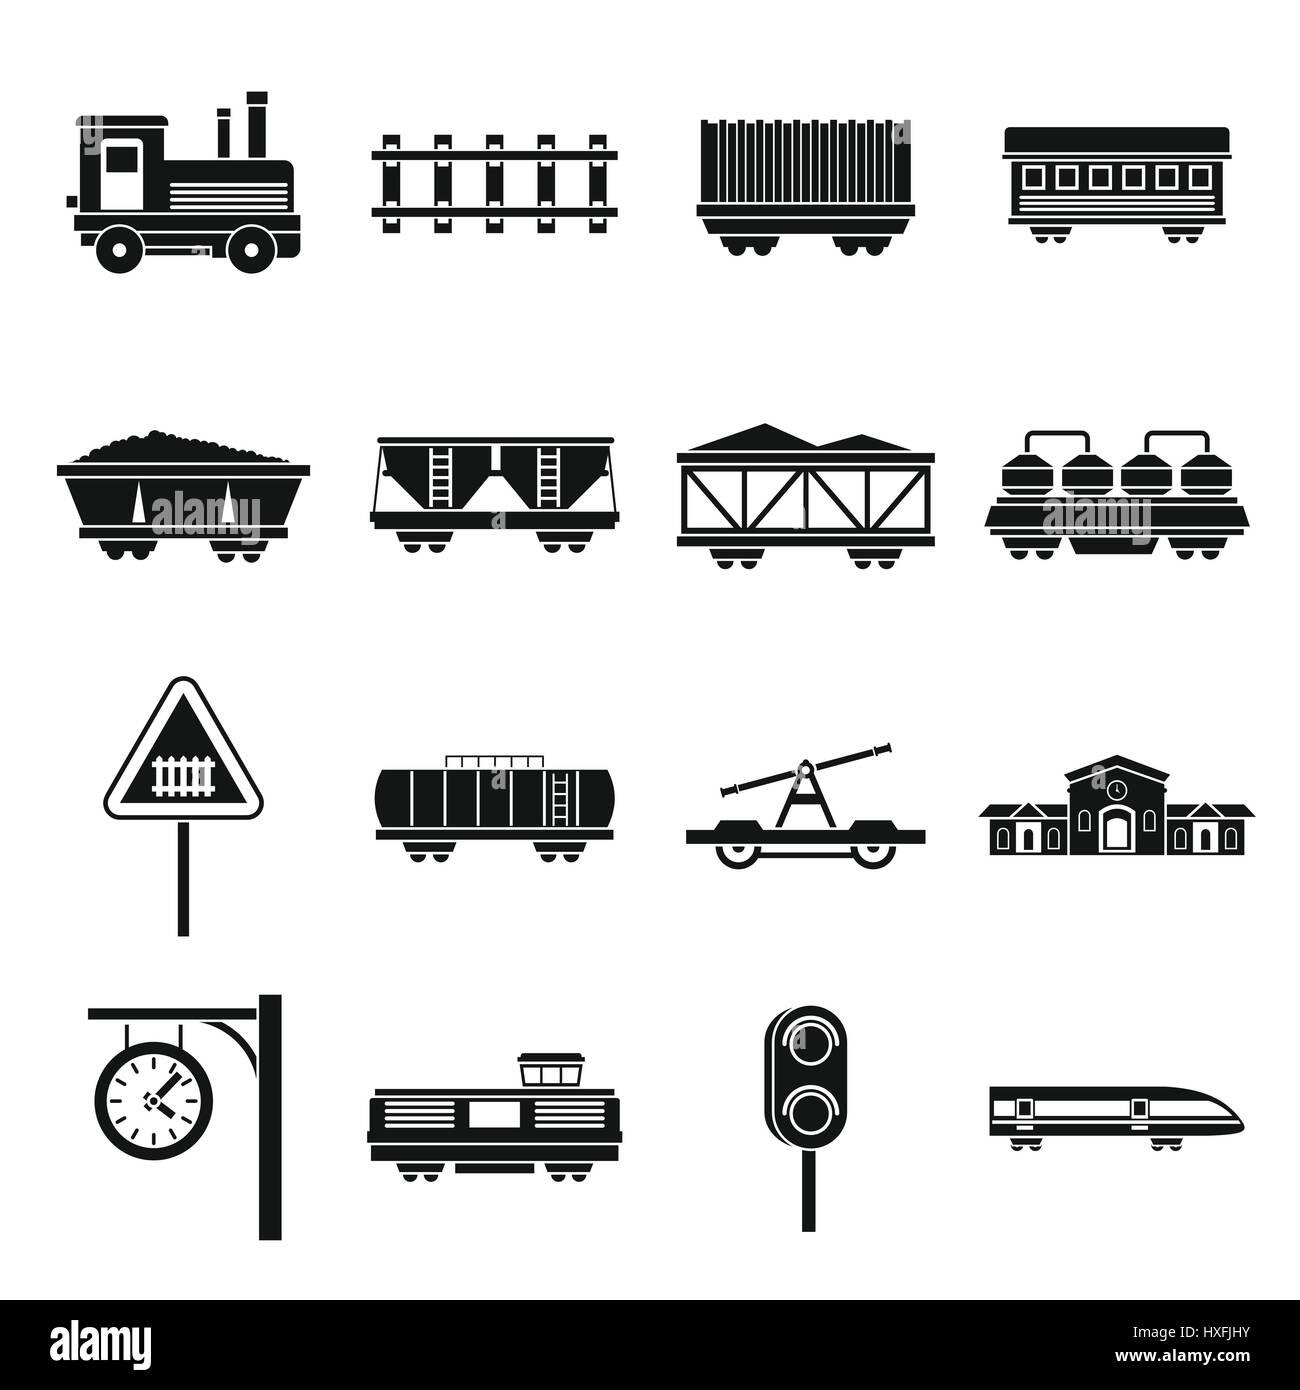 Railway icons set, simple style Stock Vector